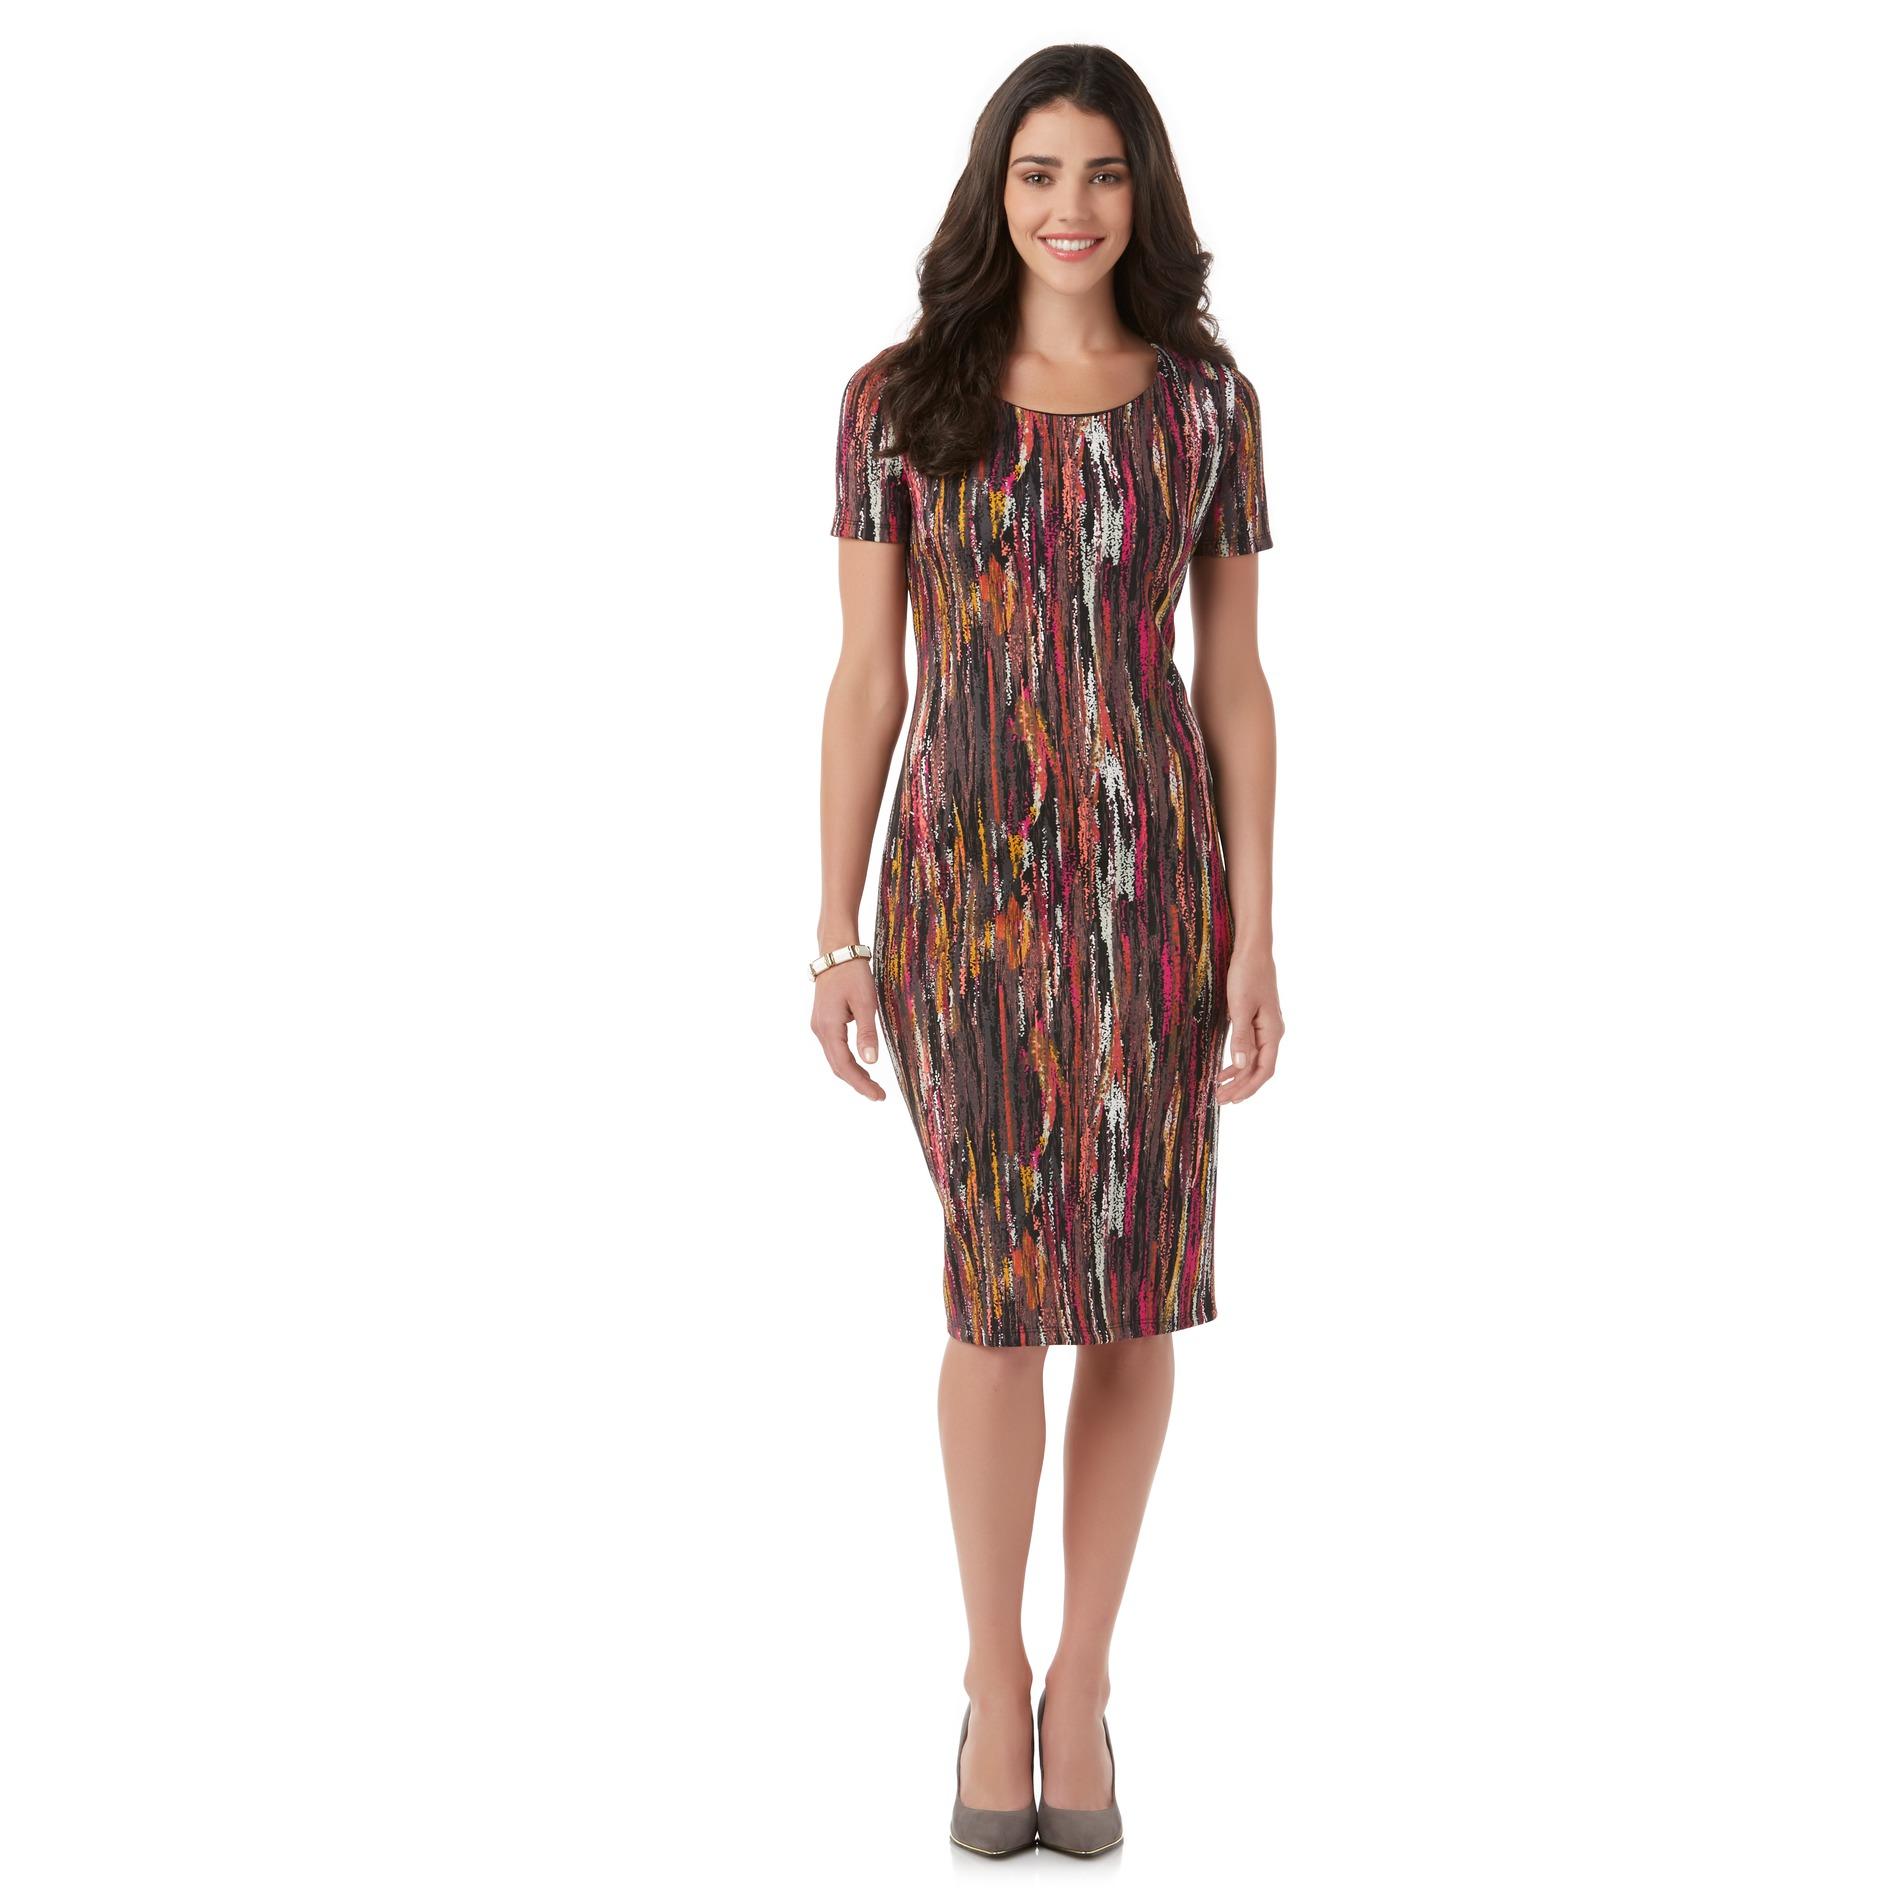 Women's Midi Dress - Abstract